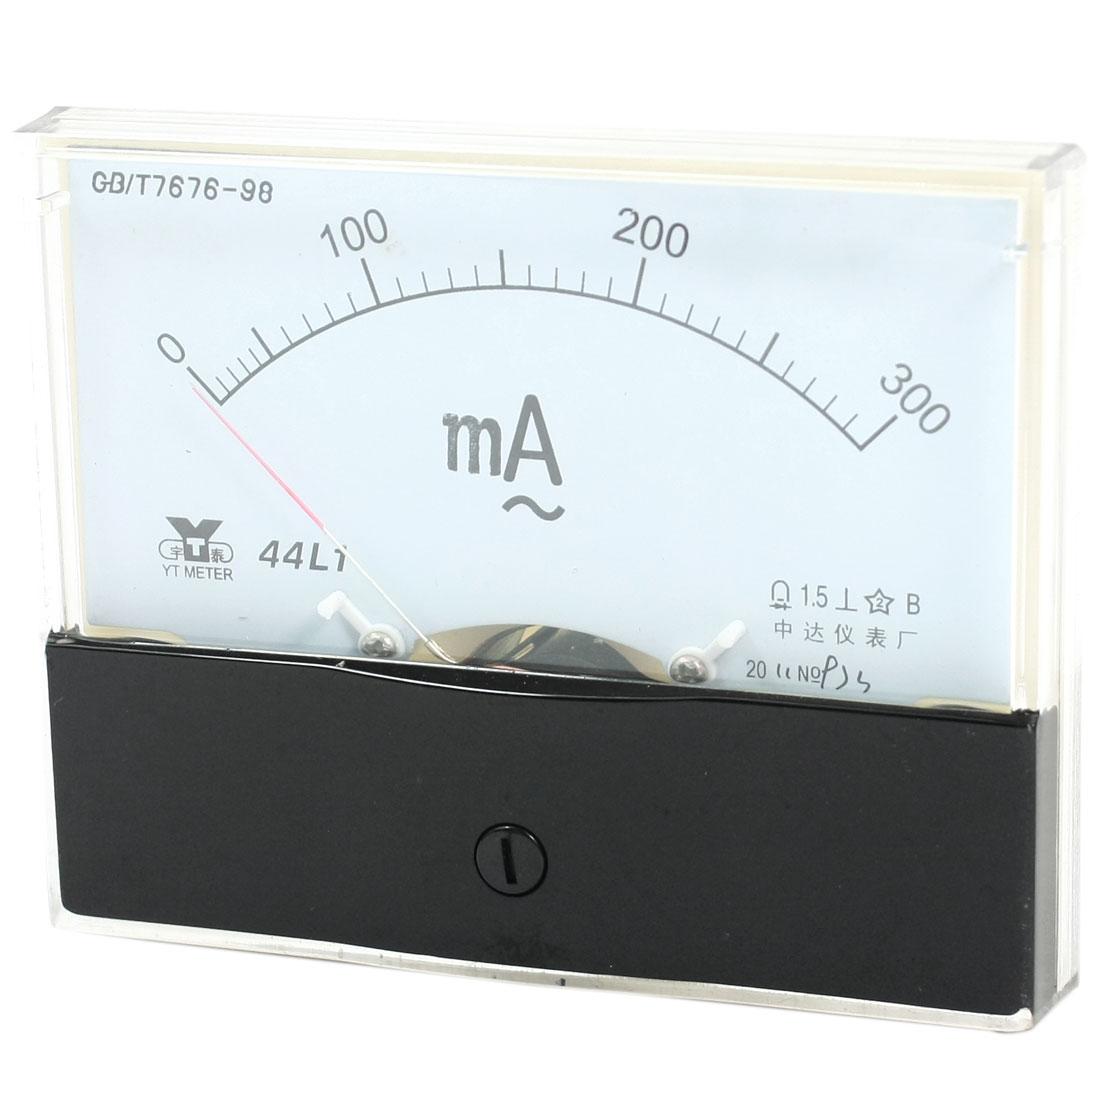 Measurement Tool Panel Mount Analog Ammeter Gauge AC 0 - 300mA Measuring Range 44L1